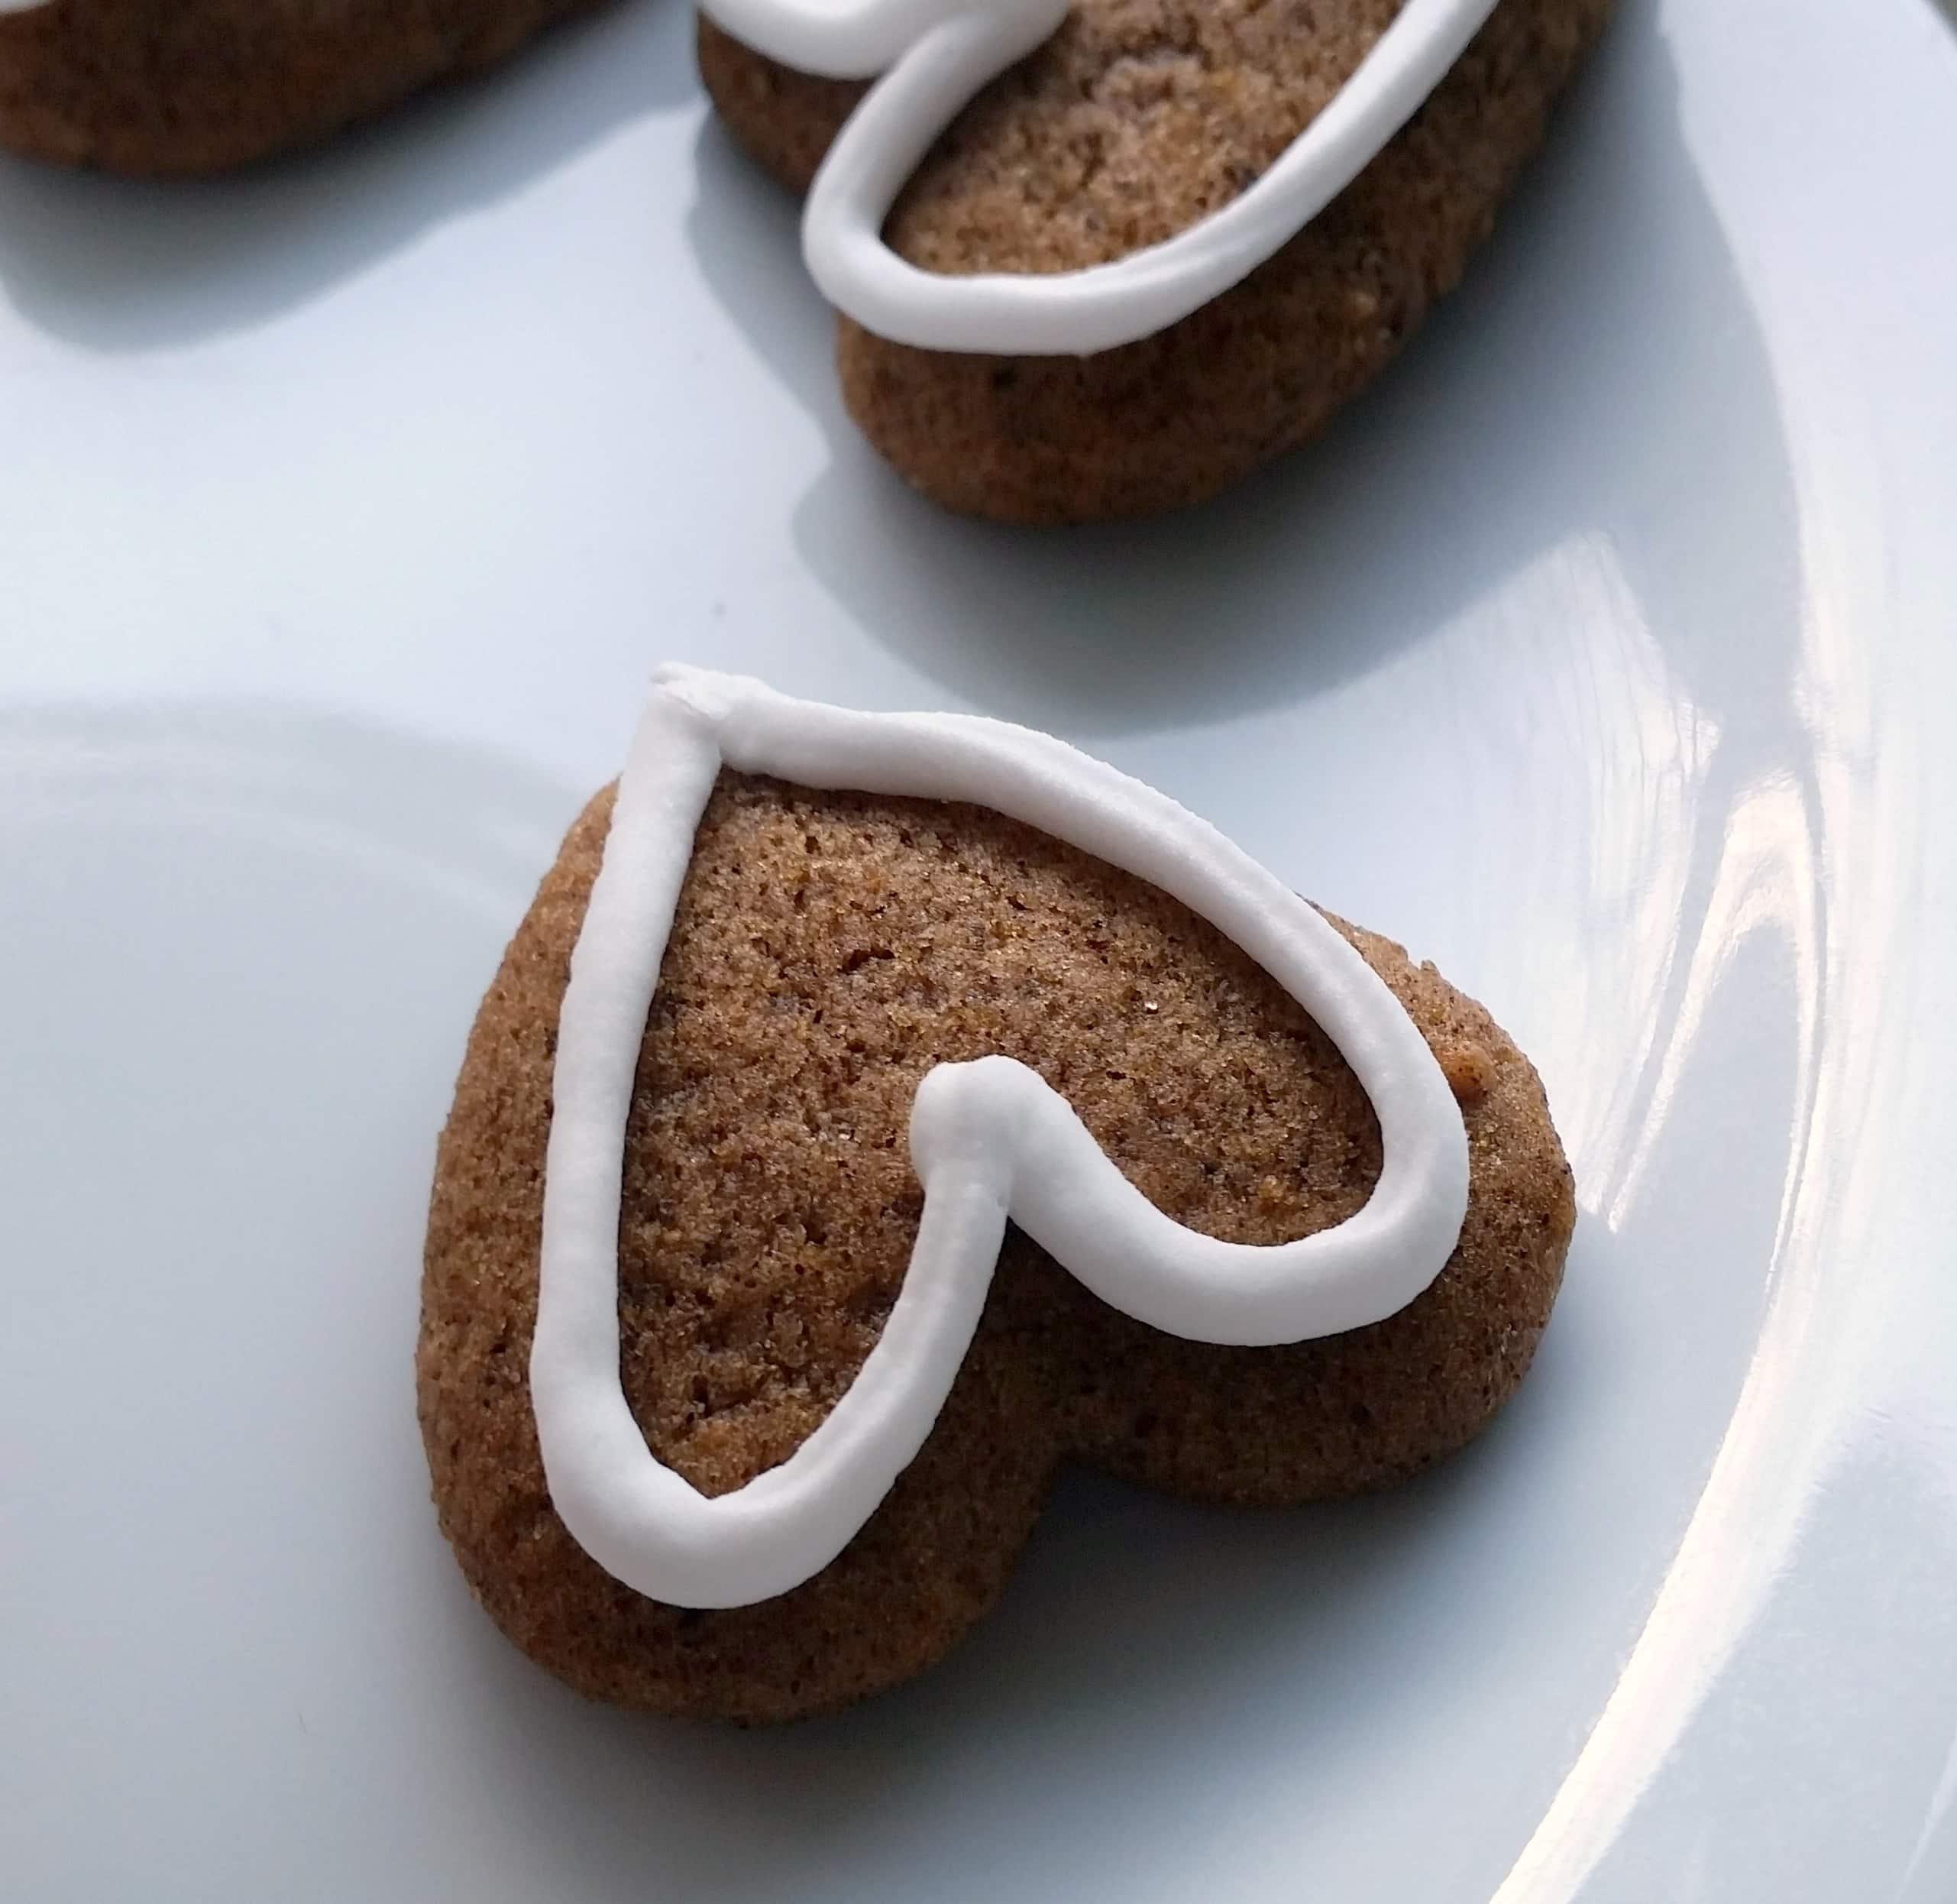 Honningkage - dansk julekage .Find inspiration til din jul, gratis print og opskrifter på danishthings.com.